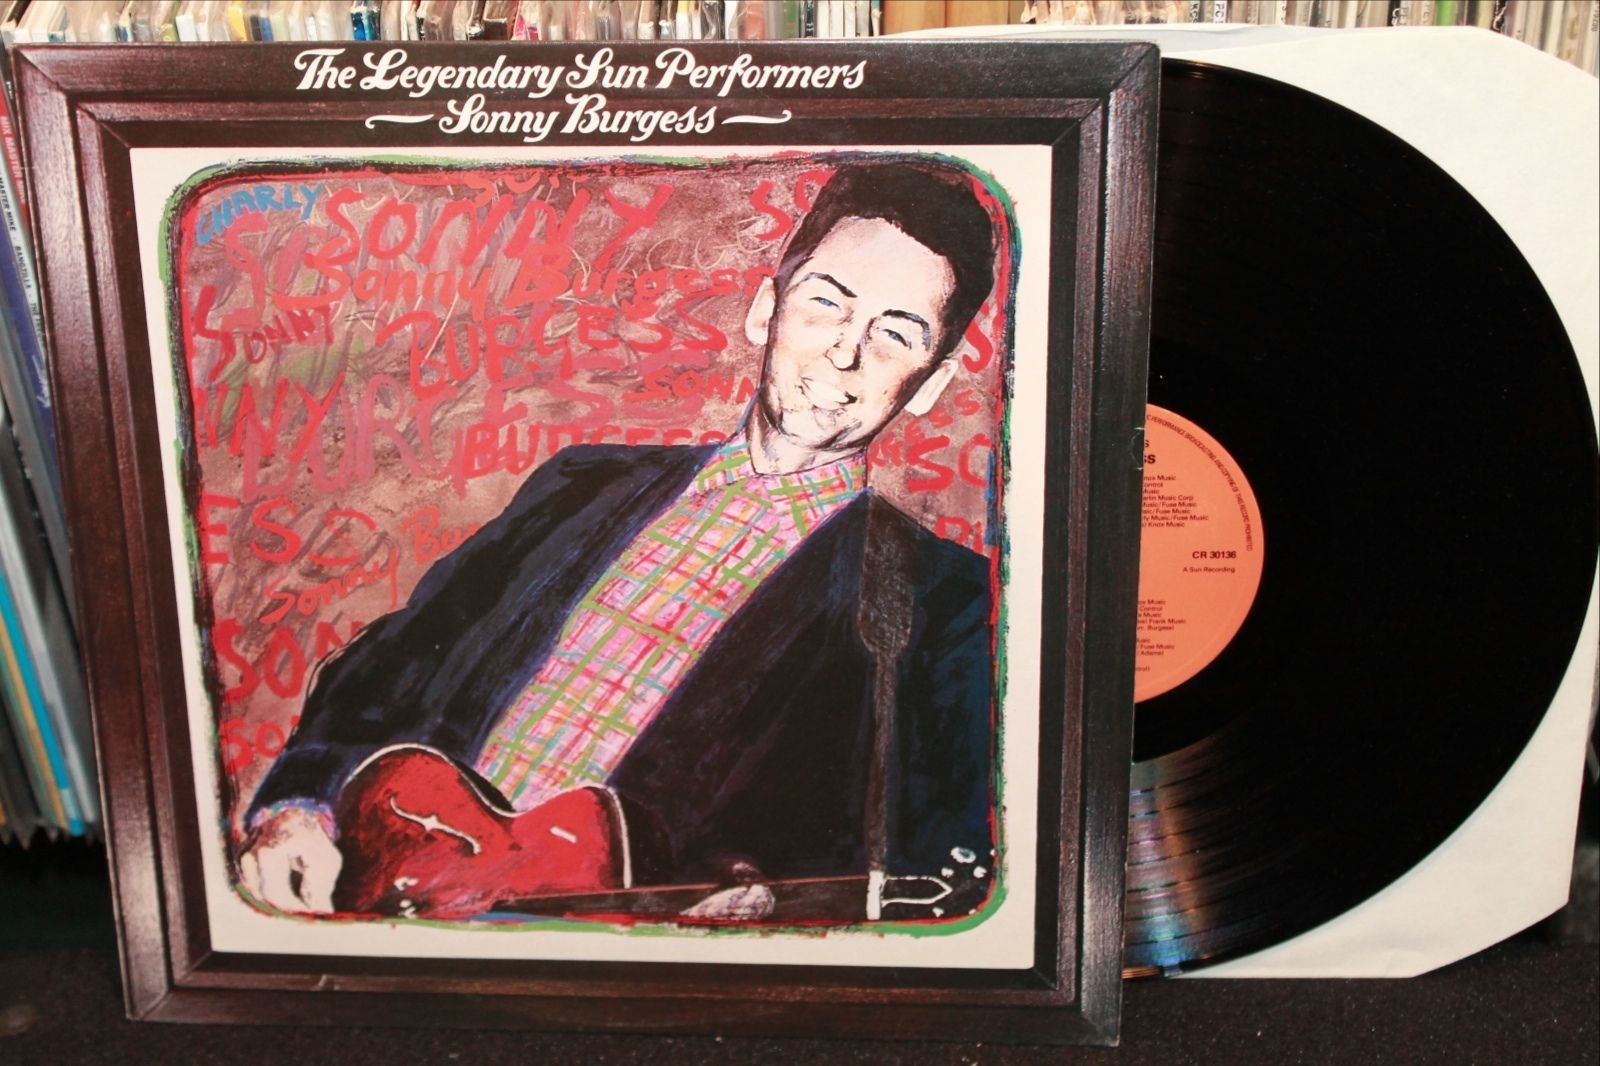 Sonny Burgess Legendary Sun Performers Uk Lp His First Record Ever Released In England Rockabilly Roots Rock Vinyl Records Vinyl Records Rockabilly Vinyl